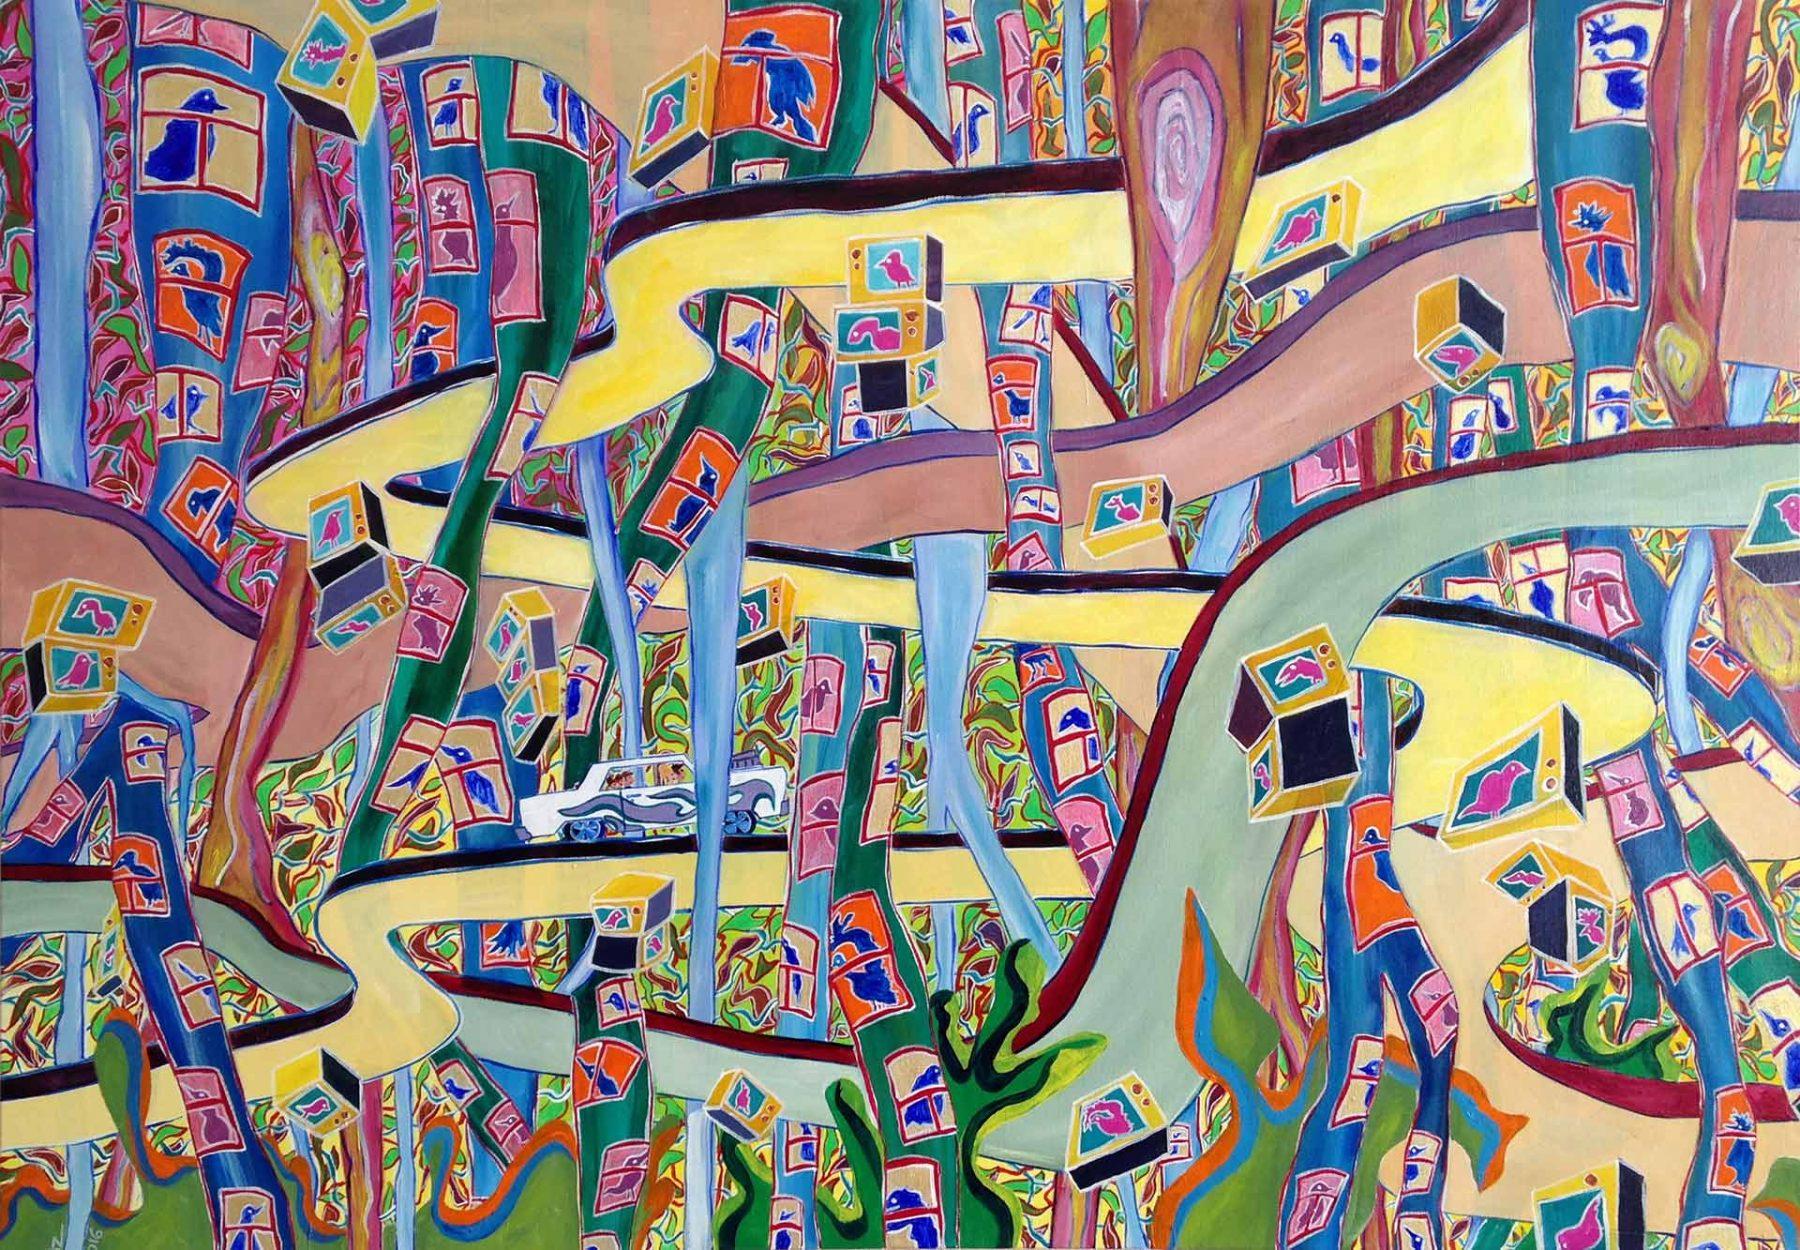 Video Birdland (2016) acrylic on canvas, 0.70H x 1W-meters